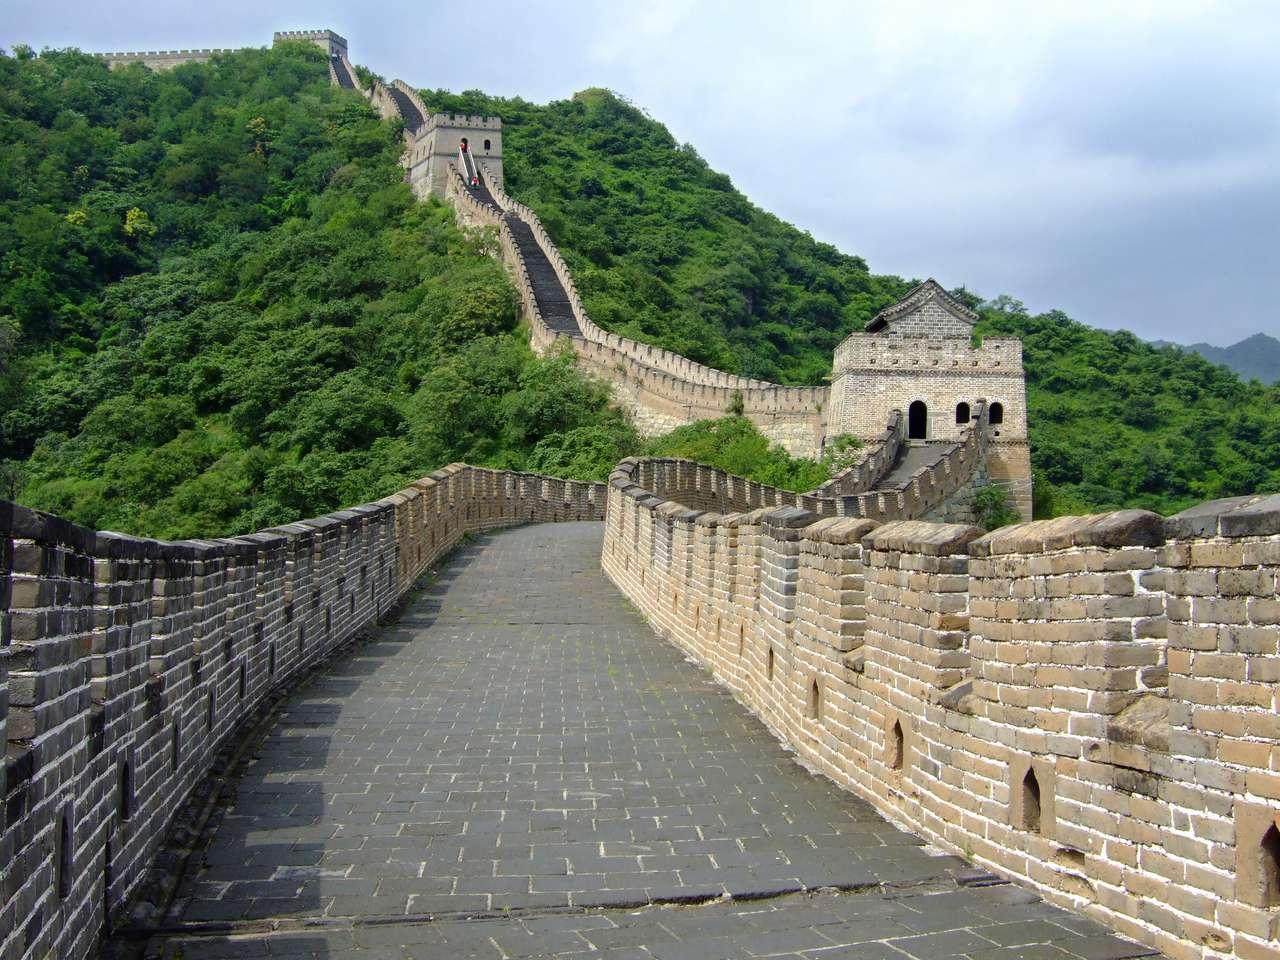 La gran muralla de mutianyu rompecabezas